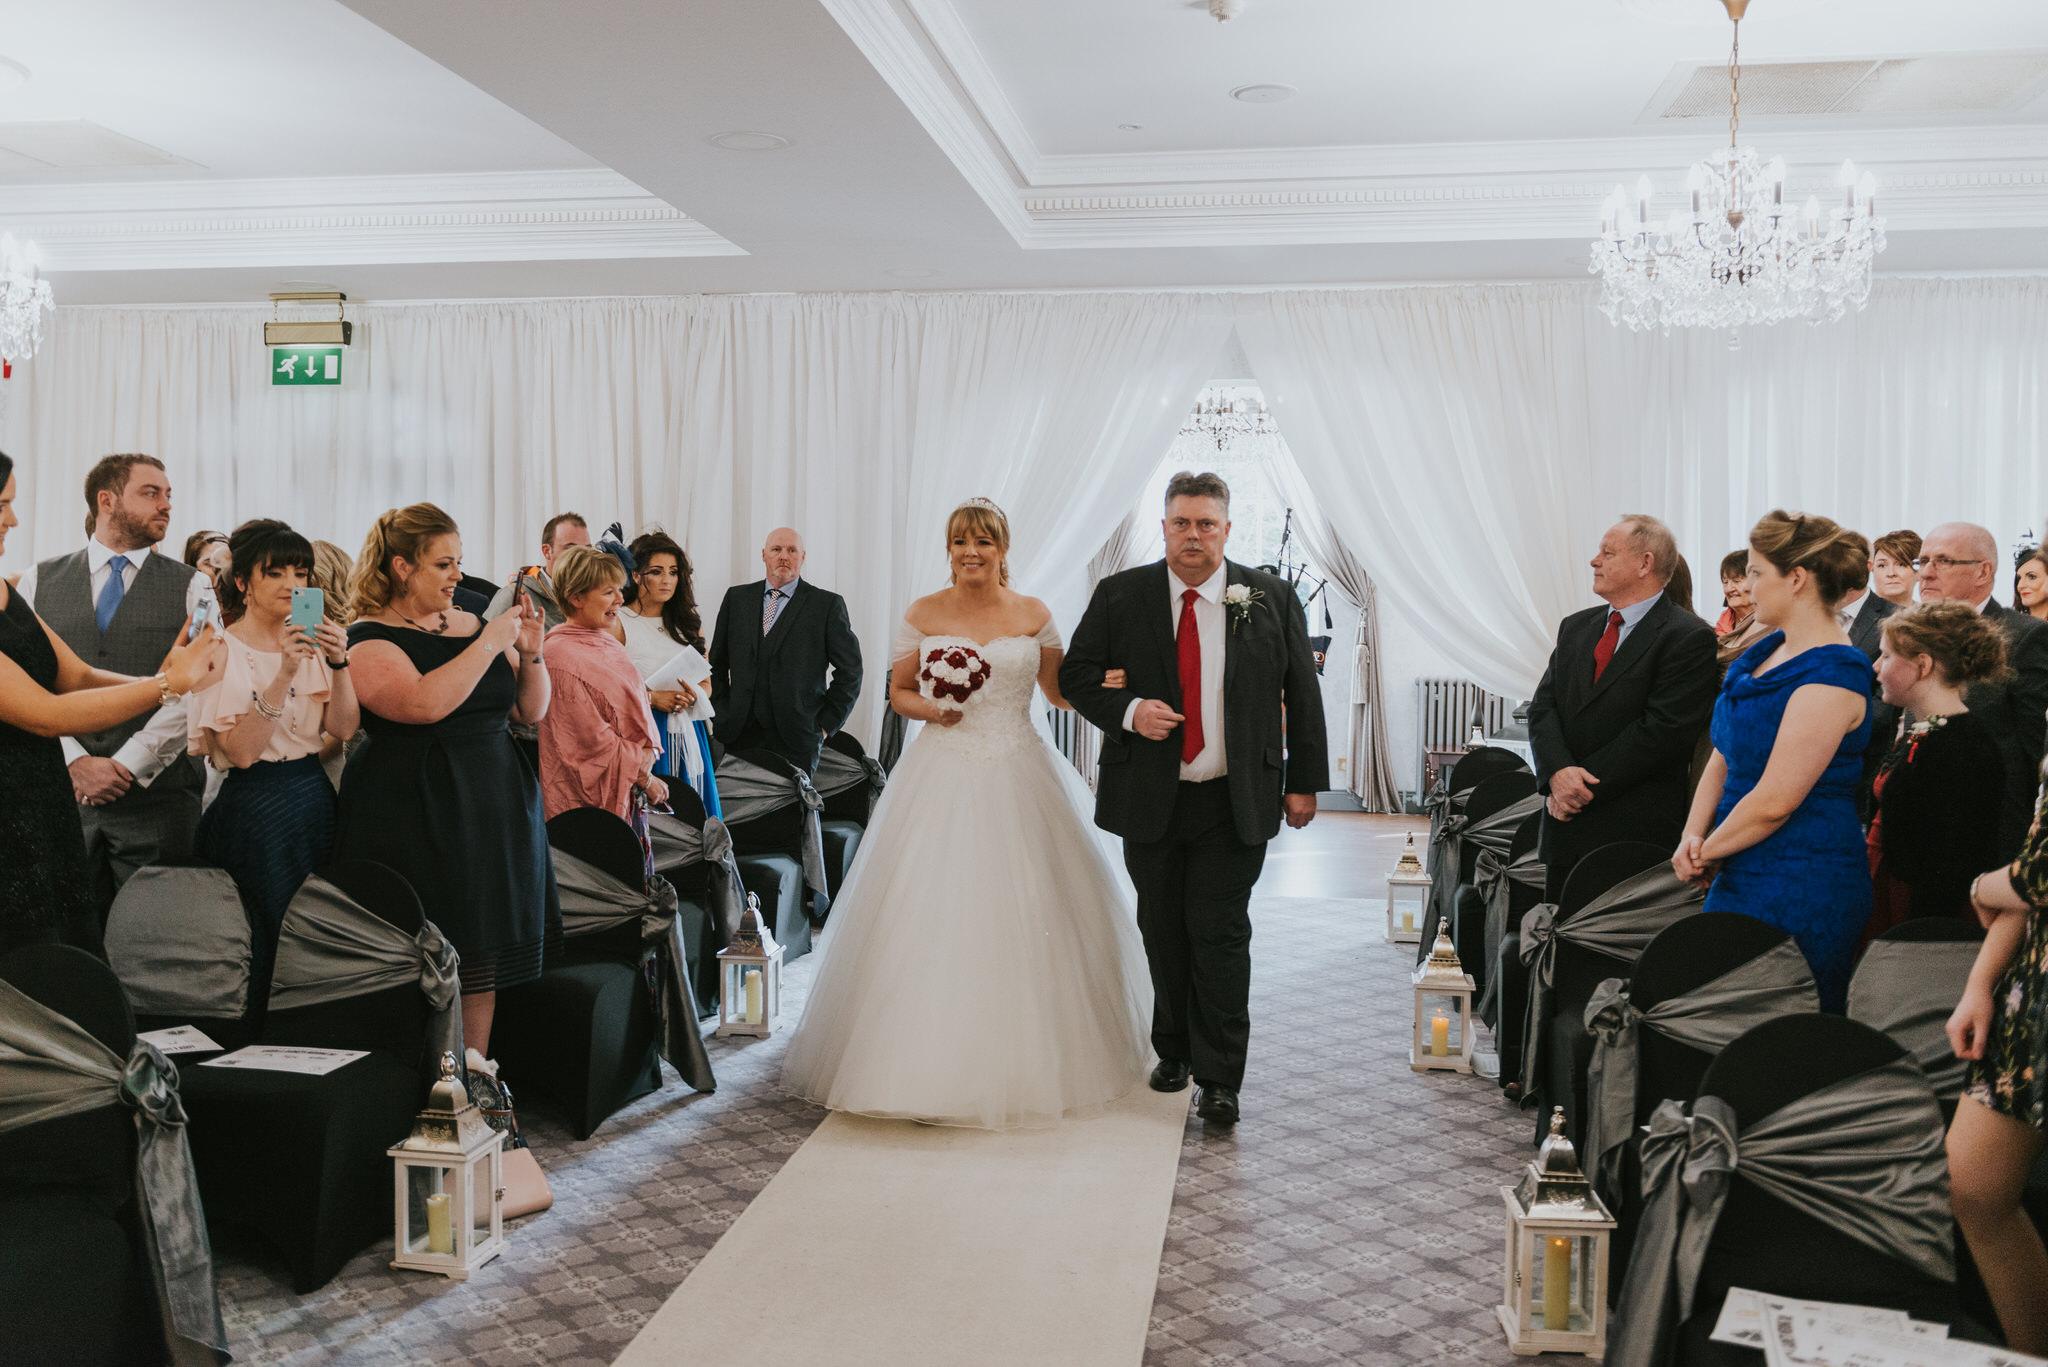 Leighinmohr_House_Hotel_Wedding_Karen_and_Garnet_37